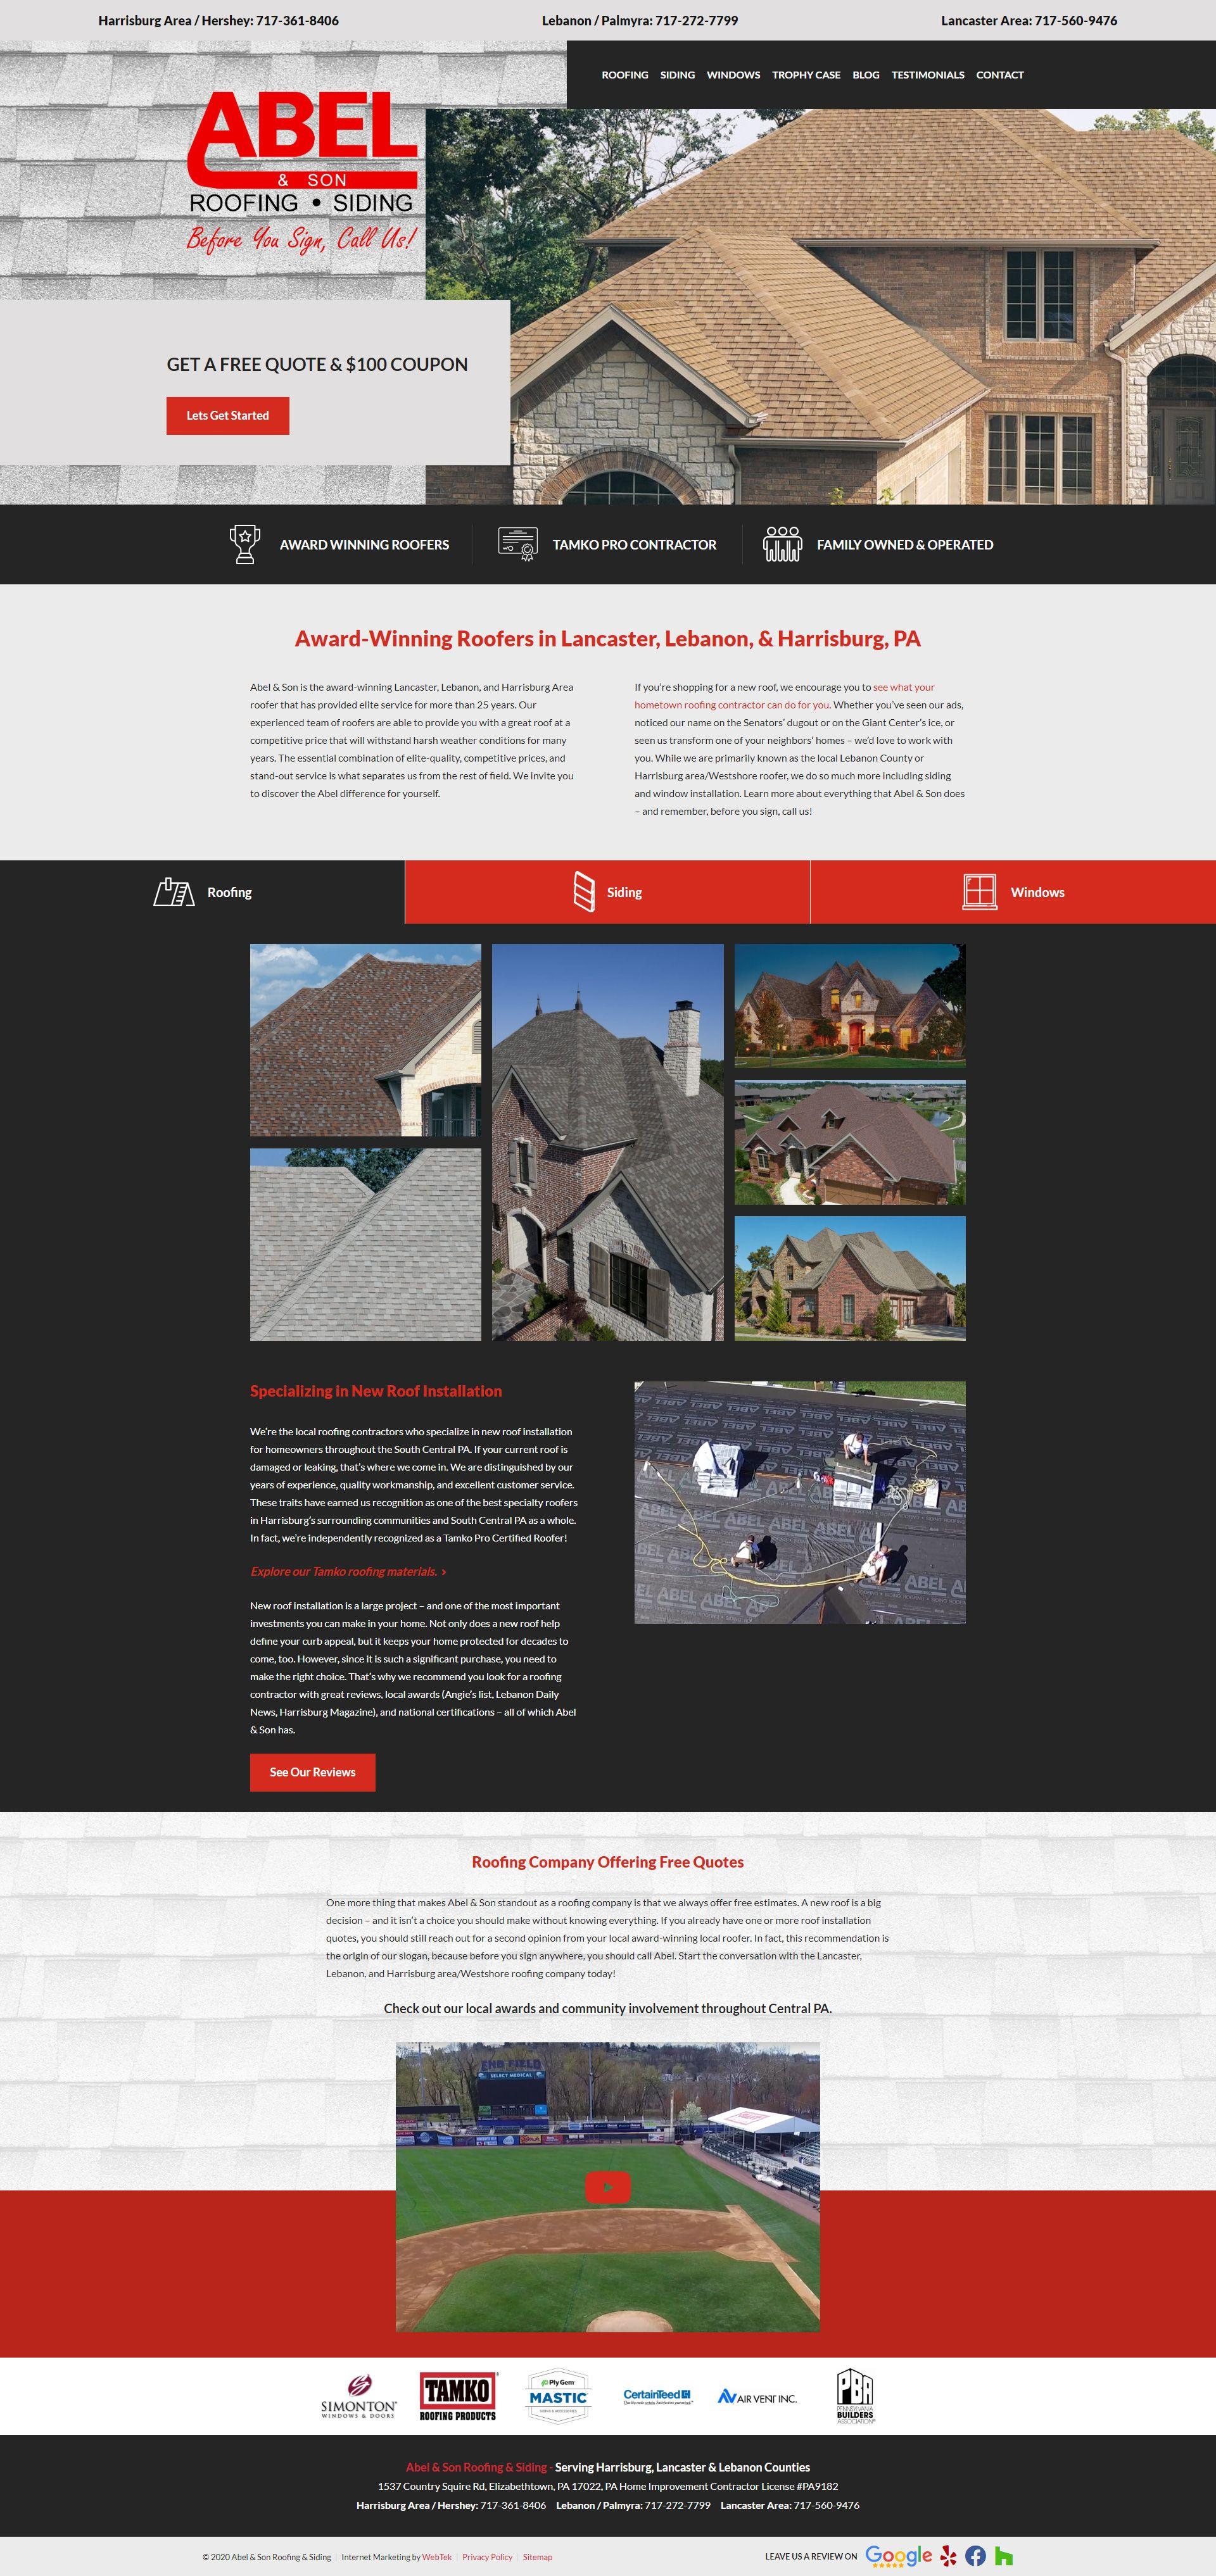 Web Design Elizabethtown Pa Roofing Contractors Building Free Quotes